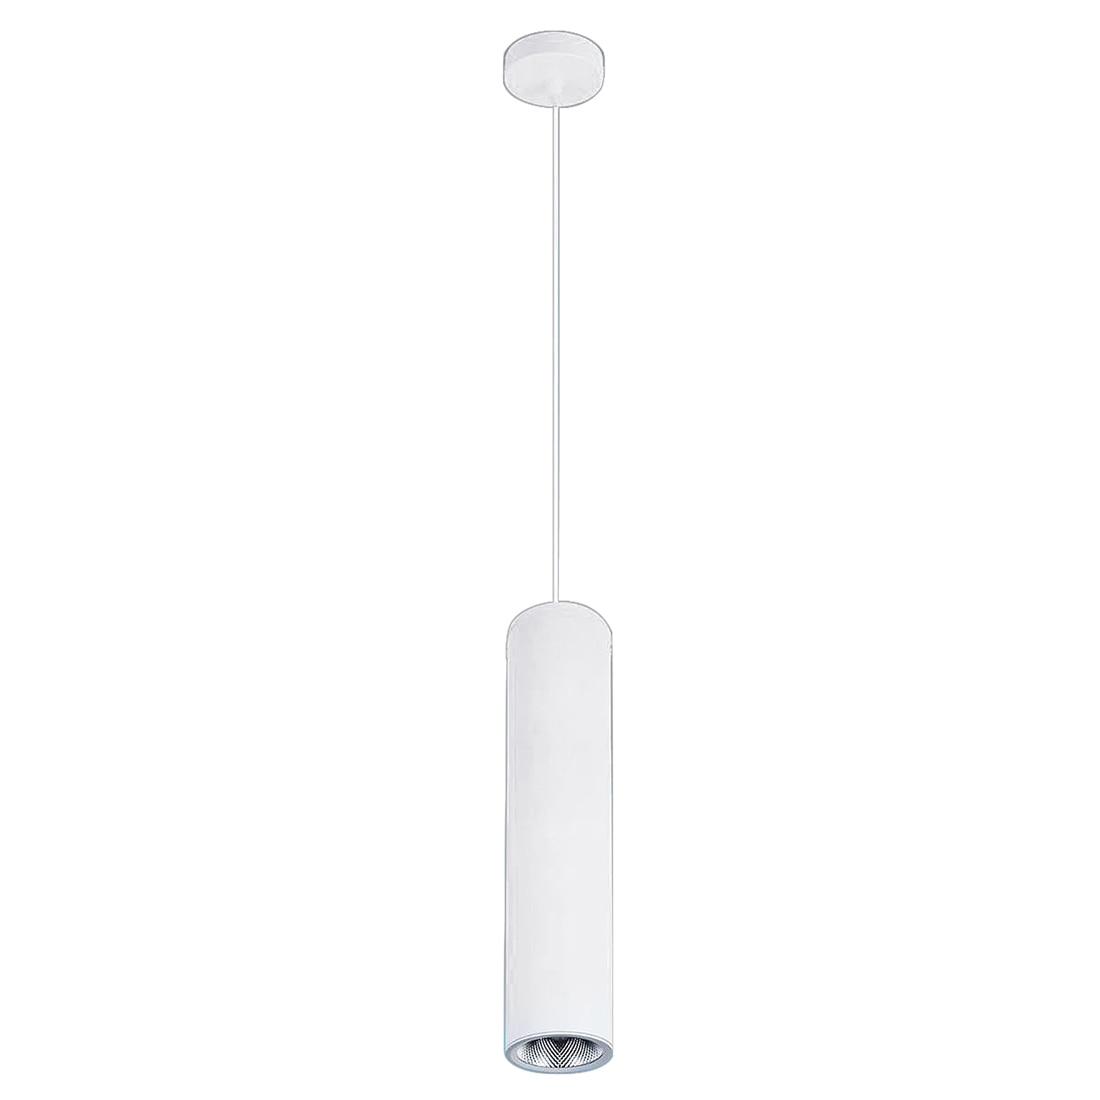 Modern Minimalist Cafe Chandeliers Led Restaurant COB Spotlights Long Tube Hanging Lamp Bar Table Cylindrical Light